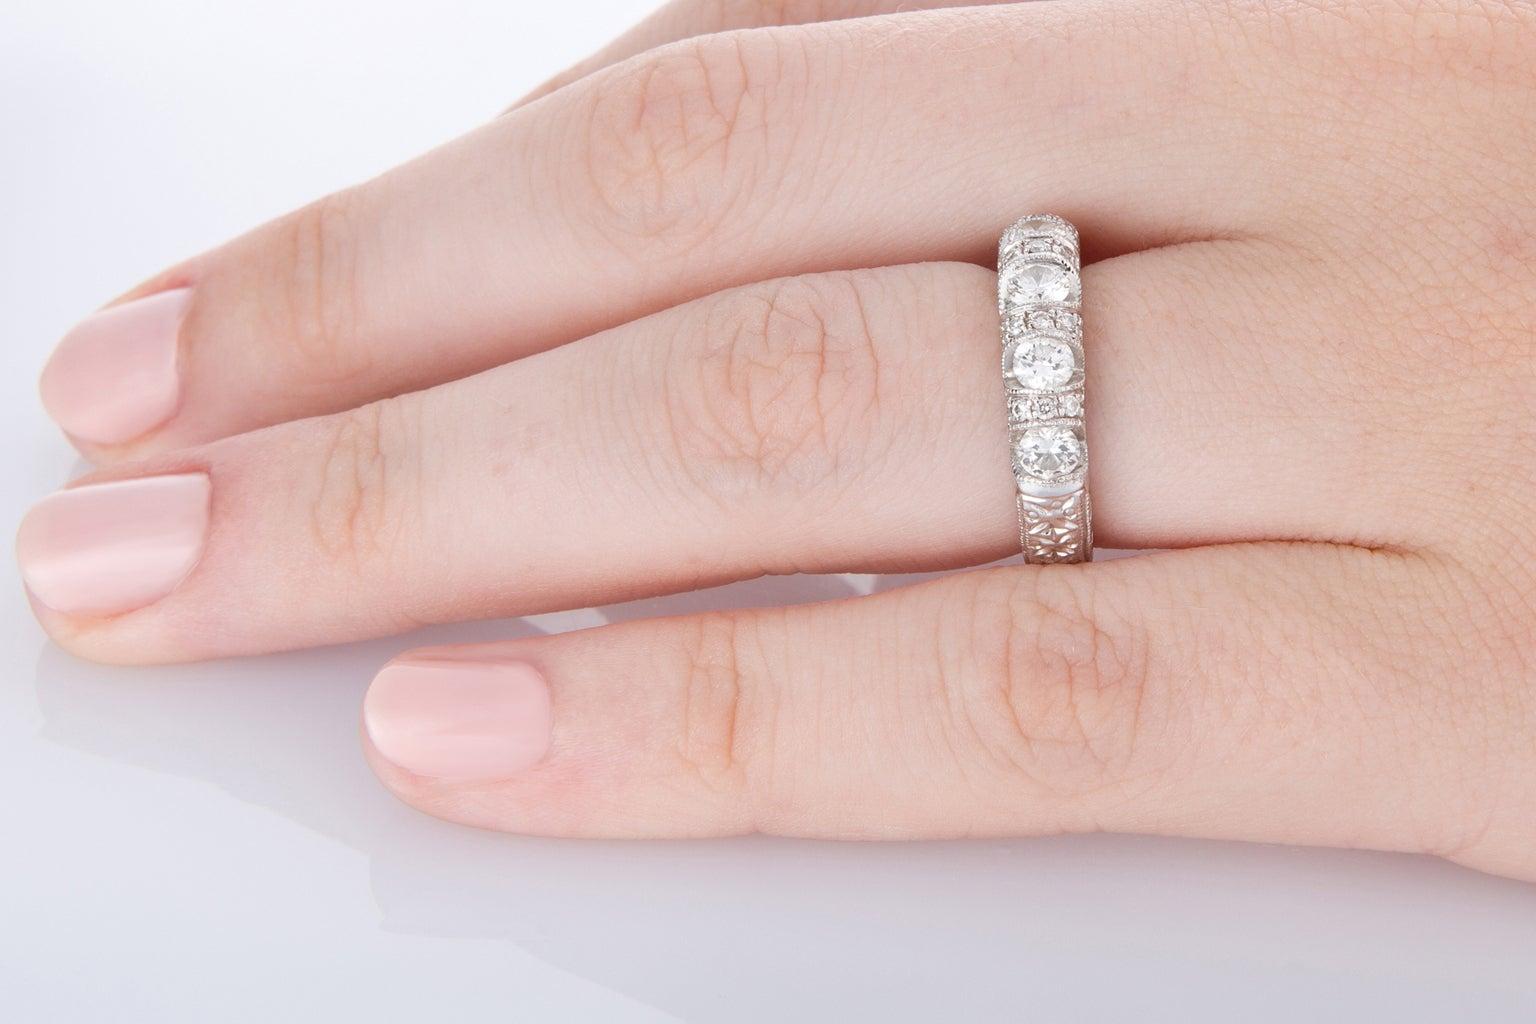 18 Karat White Gold Engraved Eternity Ring For Sale at 1stdibs